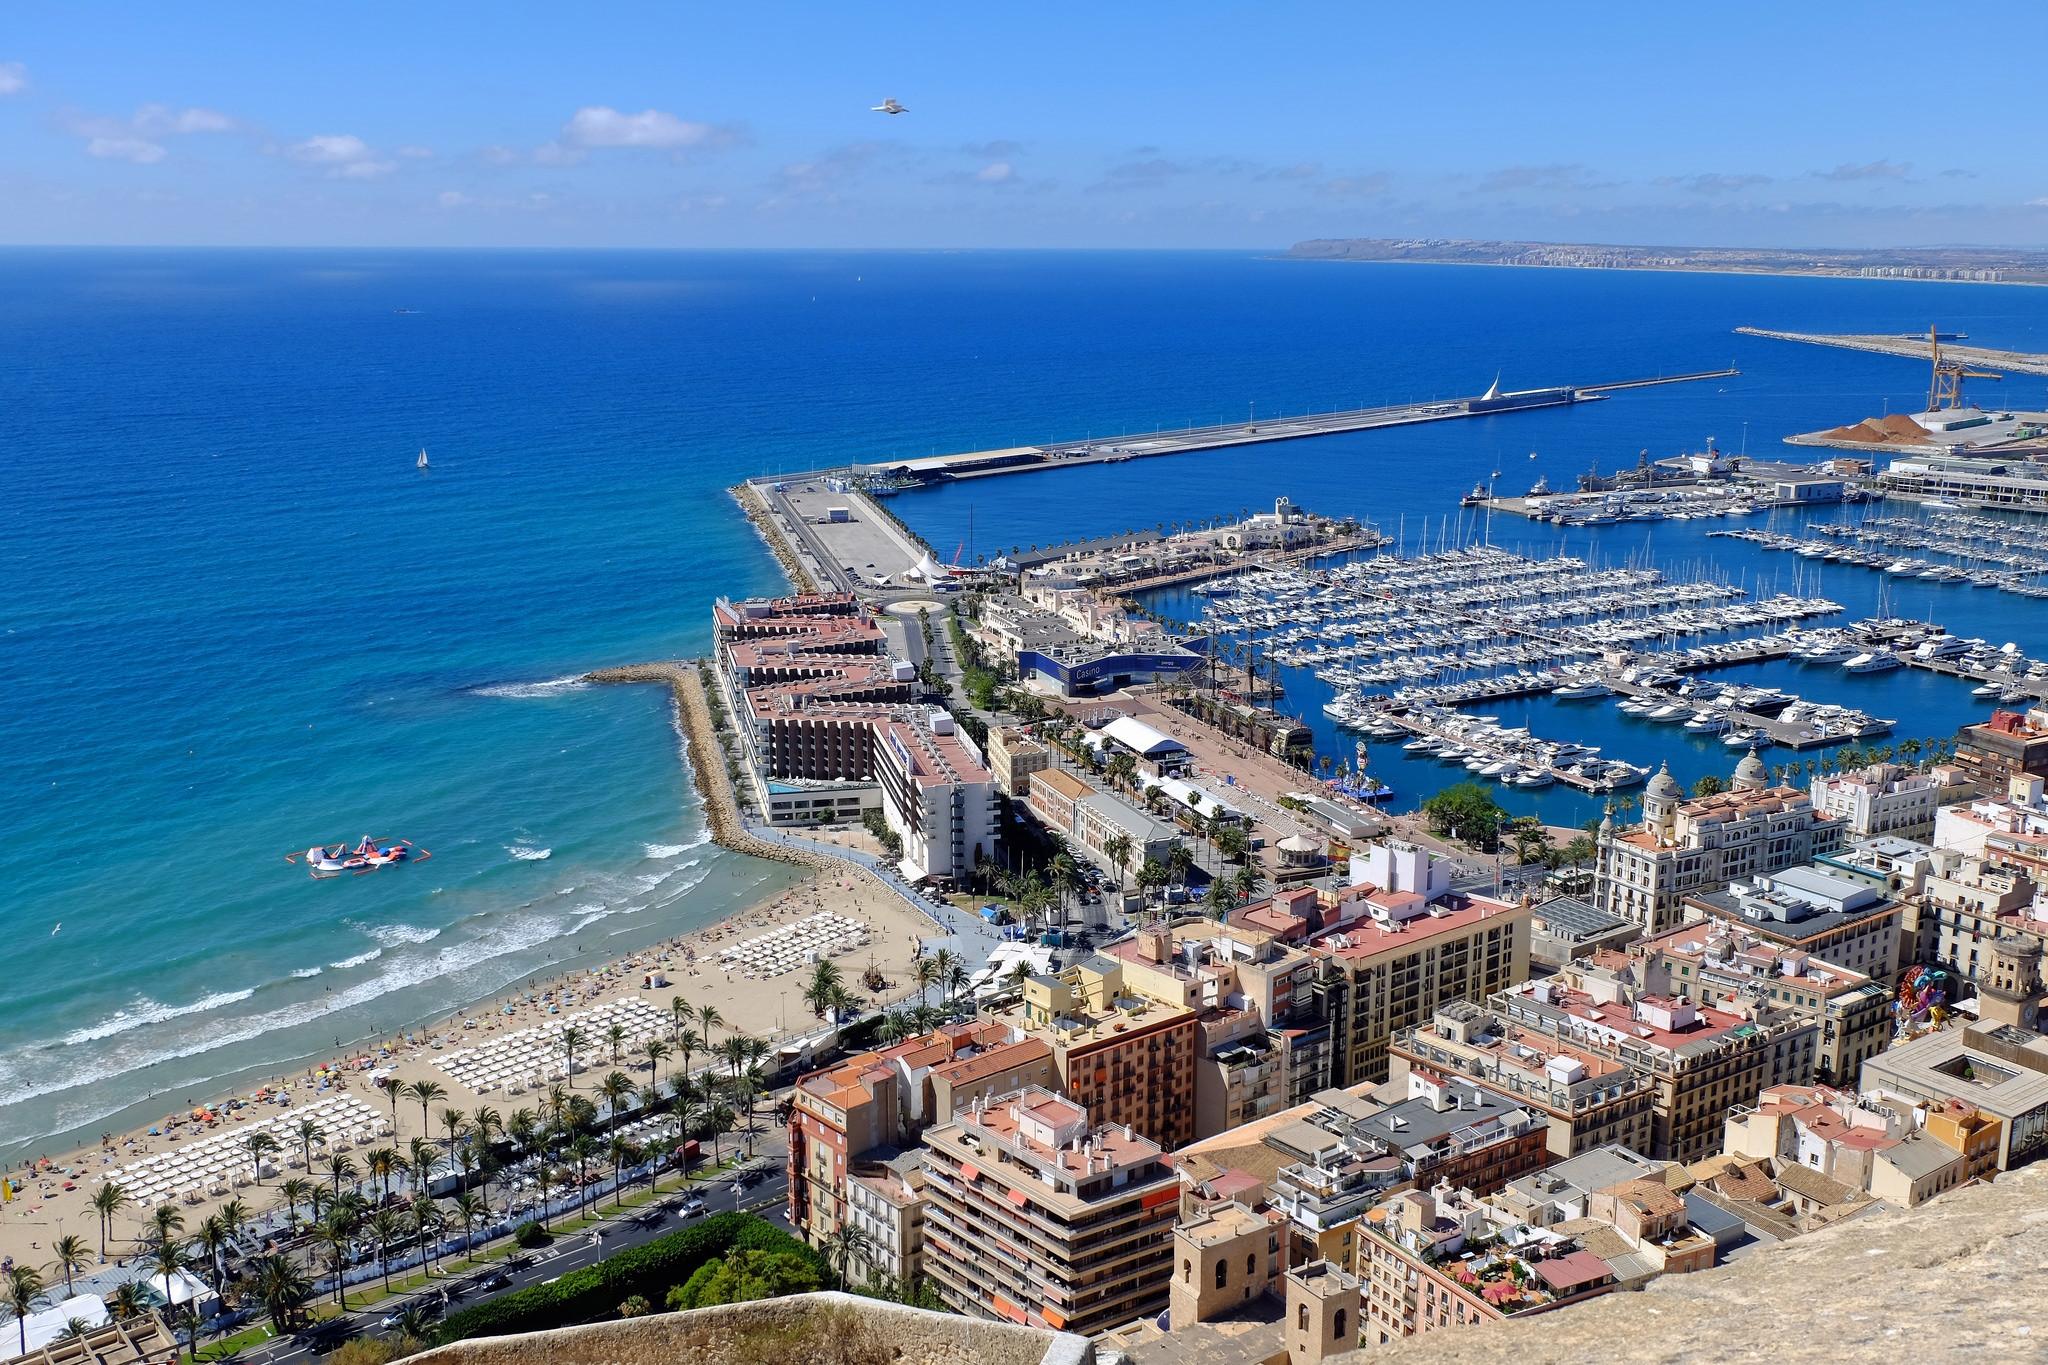 обои Alicante, Аликанте, Испания картинки фото